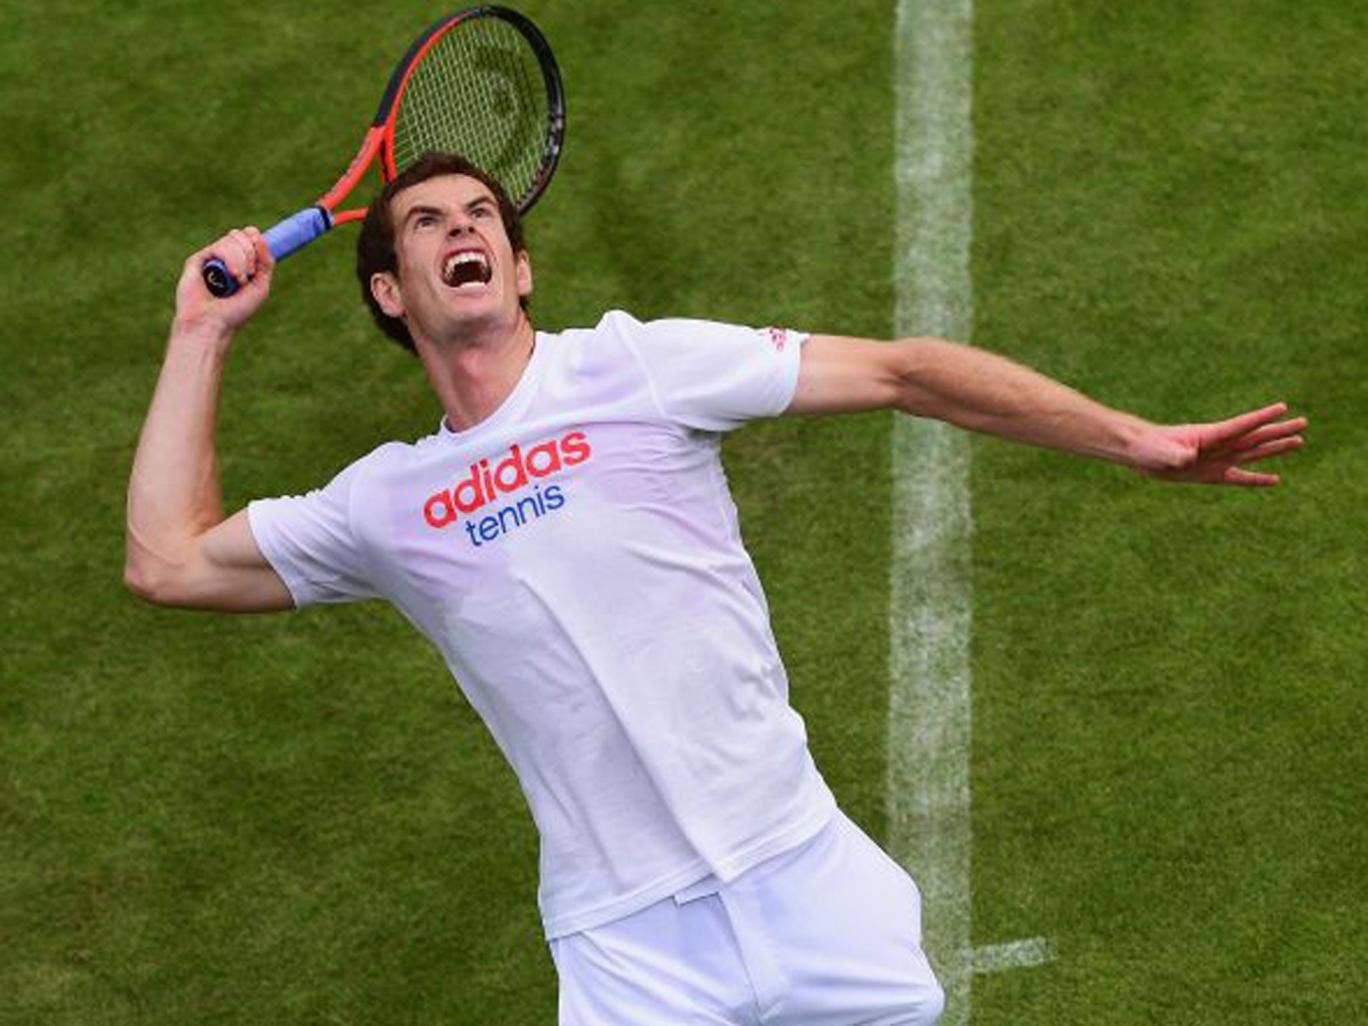 Andy Murray practises at Wimbledon before facing Benjamin Becker tomorrow